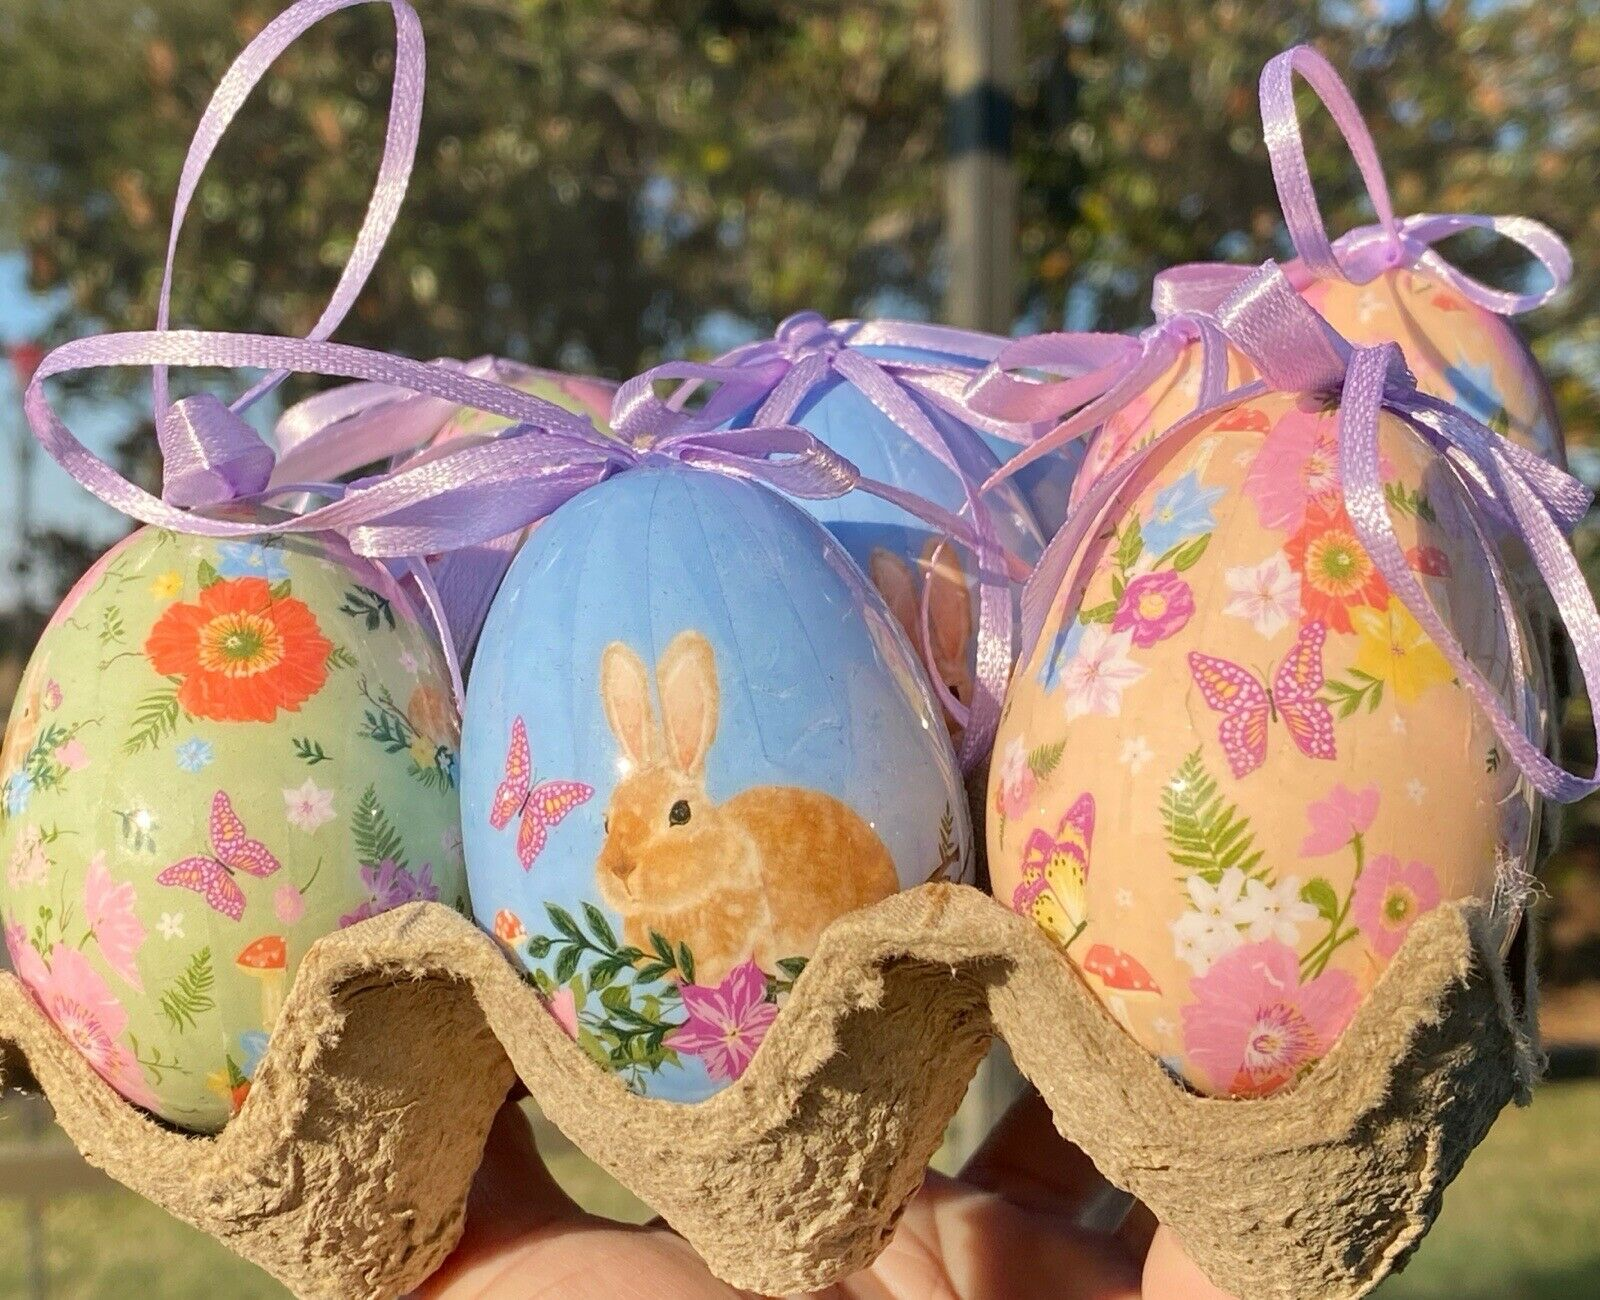 WATINC 28Pcs Easter Felt Ornaments Set Easter Egg Bunny Chick Felt Hanging Decorations Easter Party Supplies Cutouts Felt Hanging Ornaments with Rope for Tree Door Window Home Party Decor